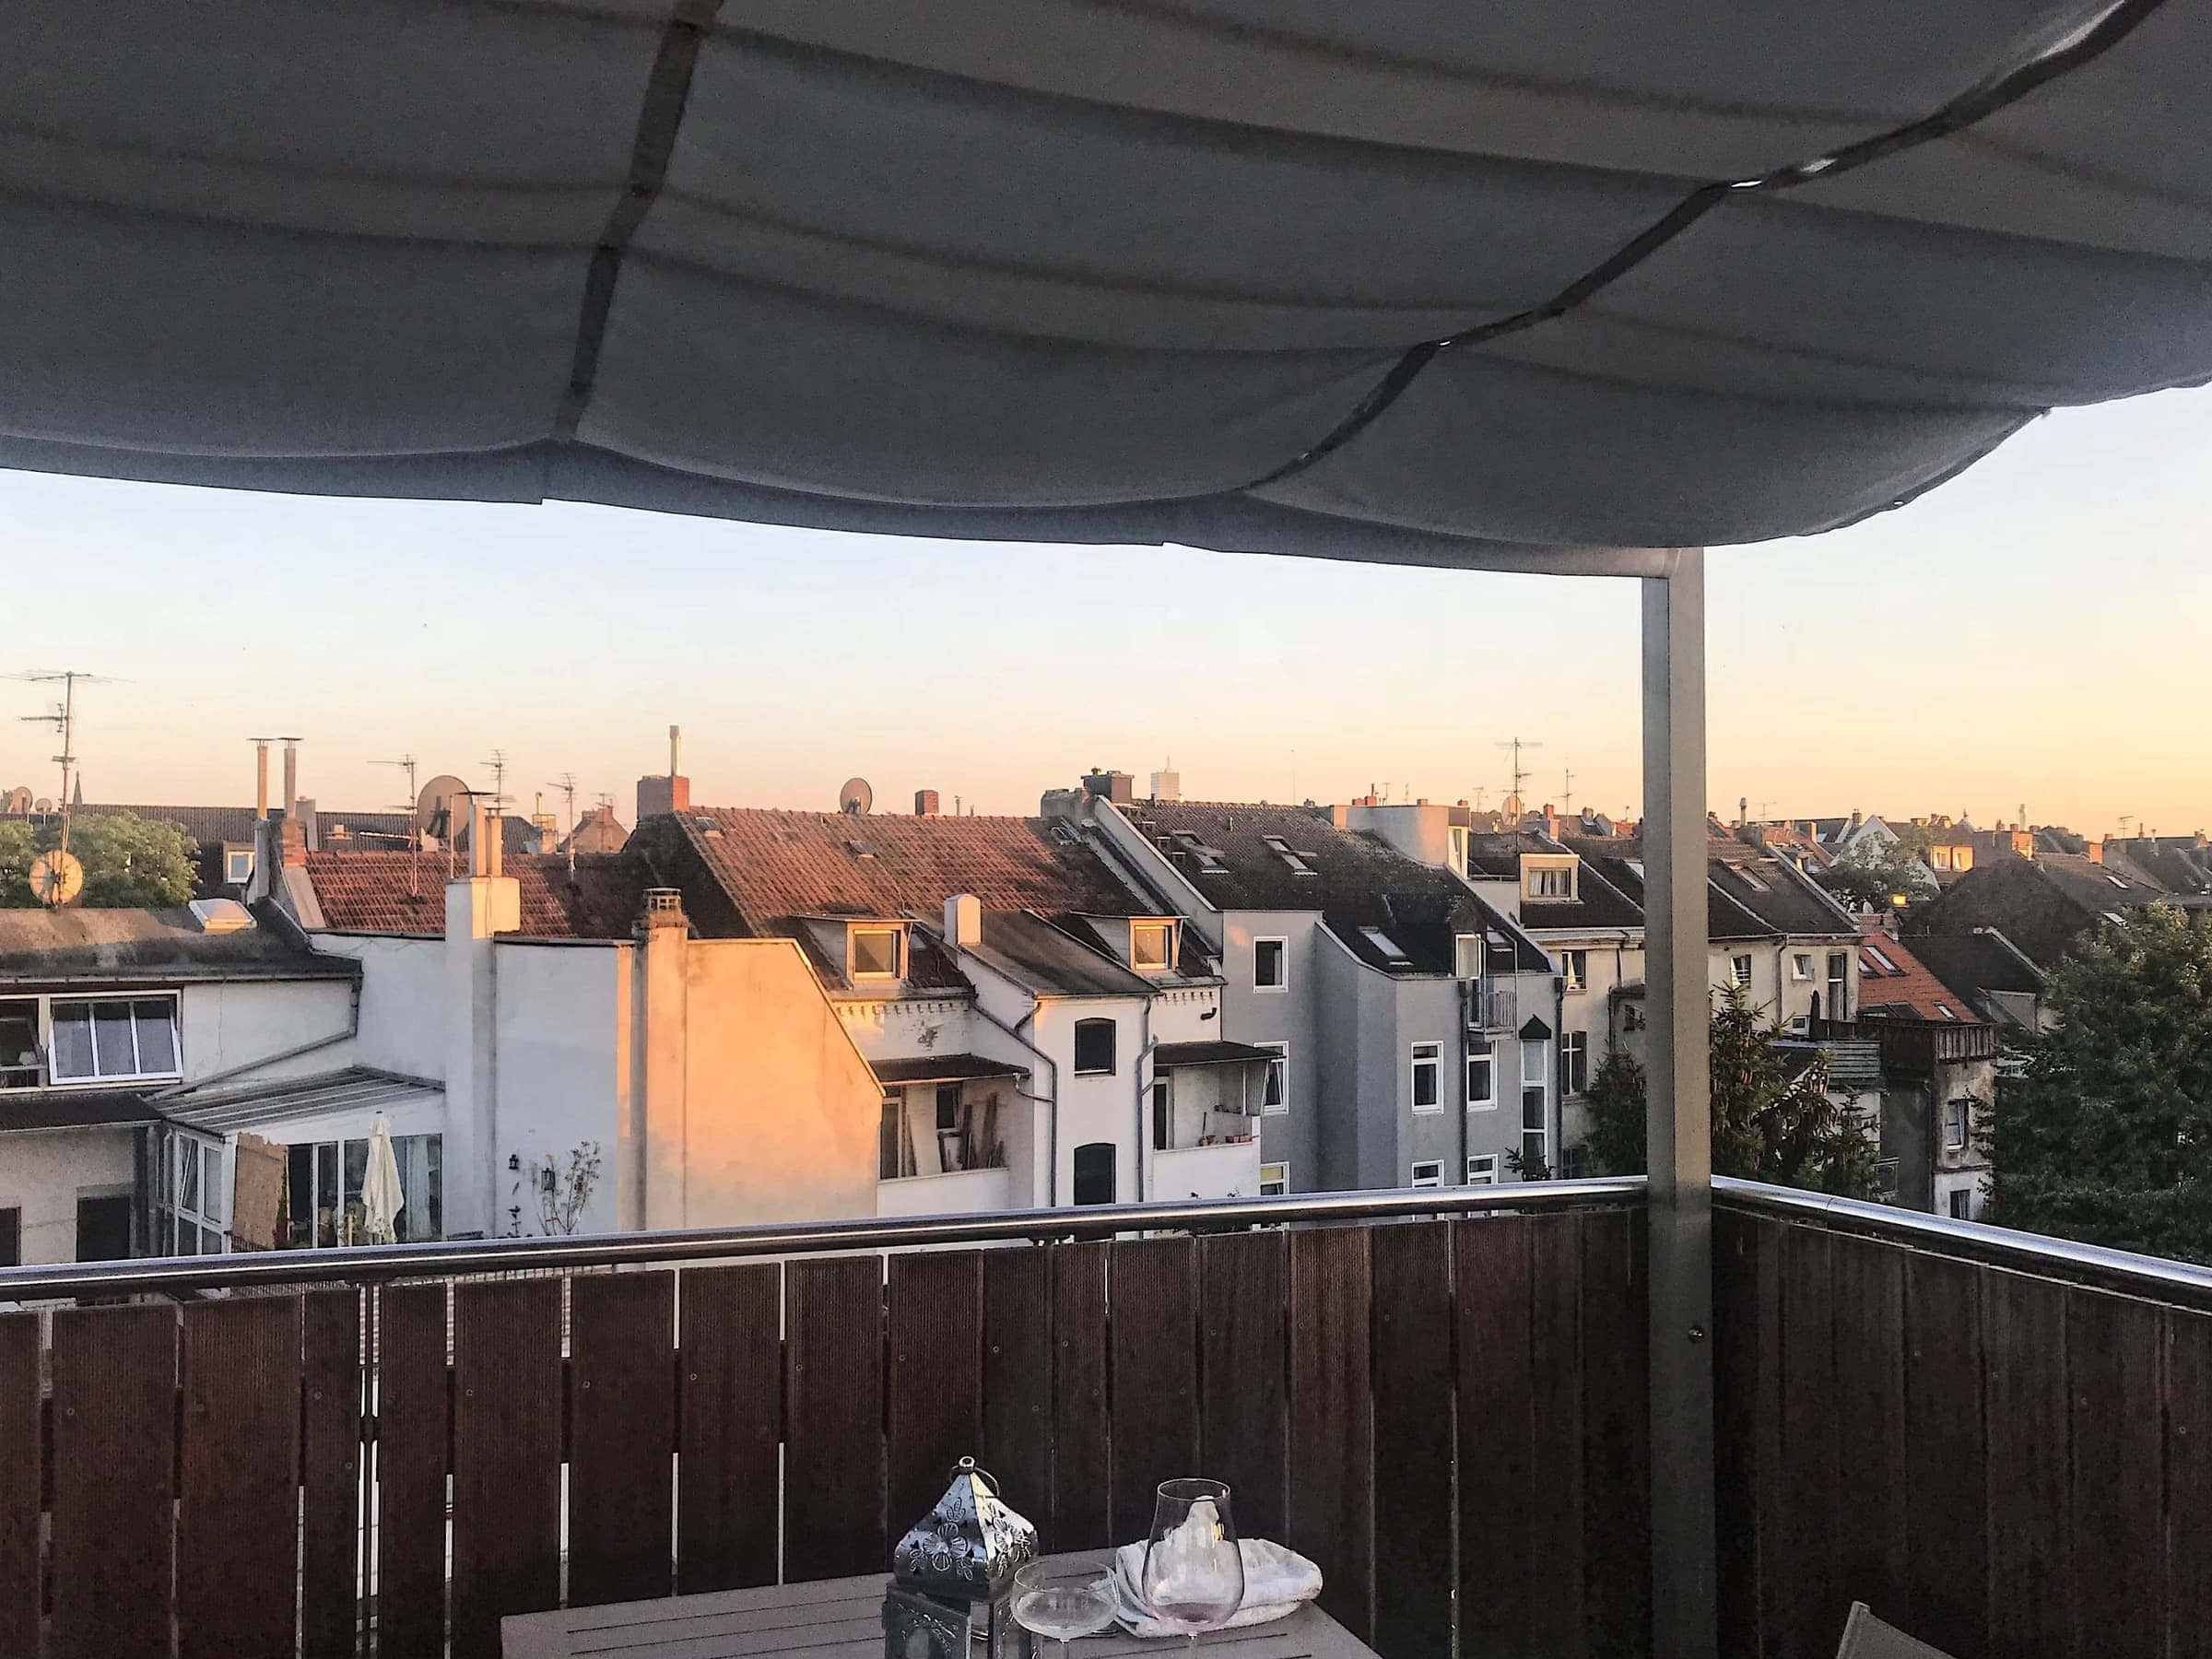 Sonnenuntergang in Köln Nippes